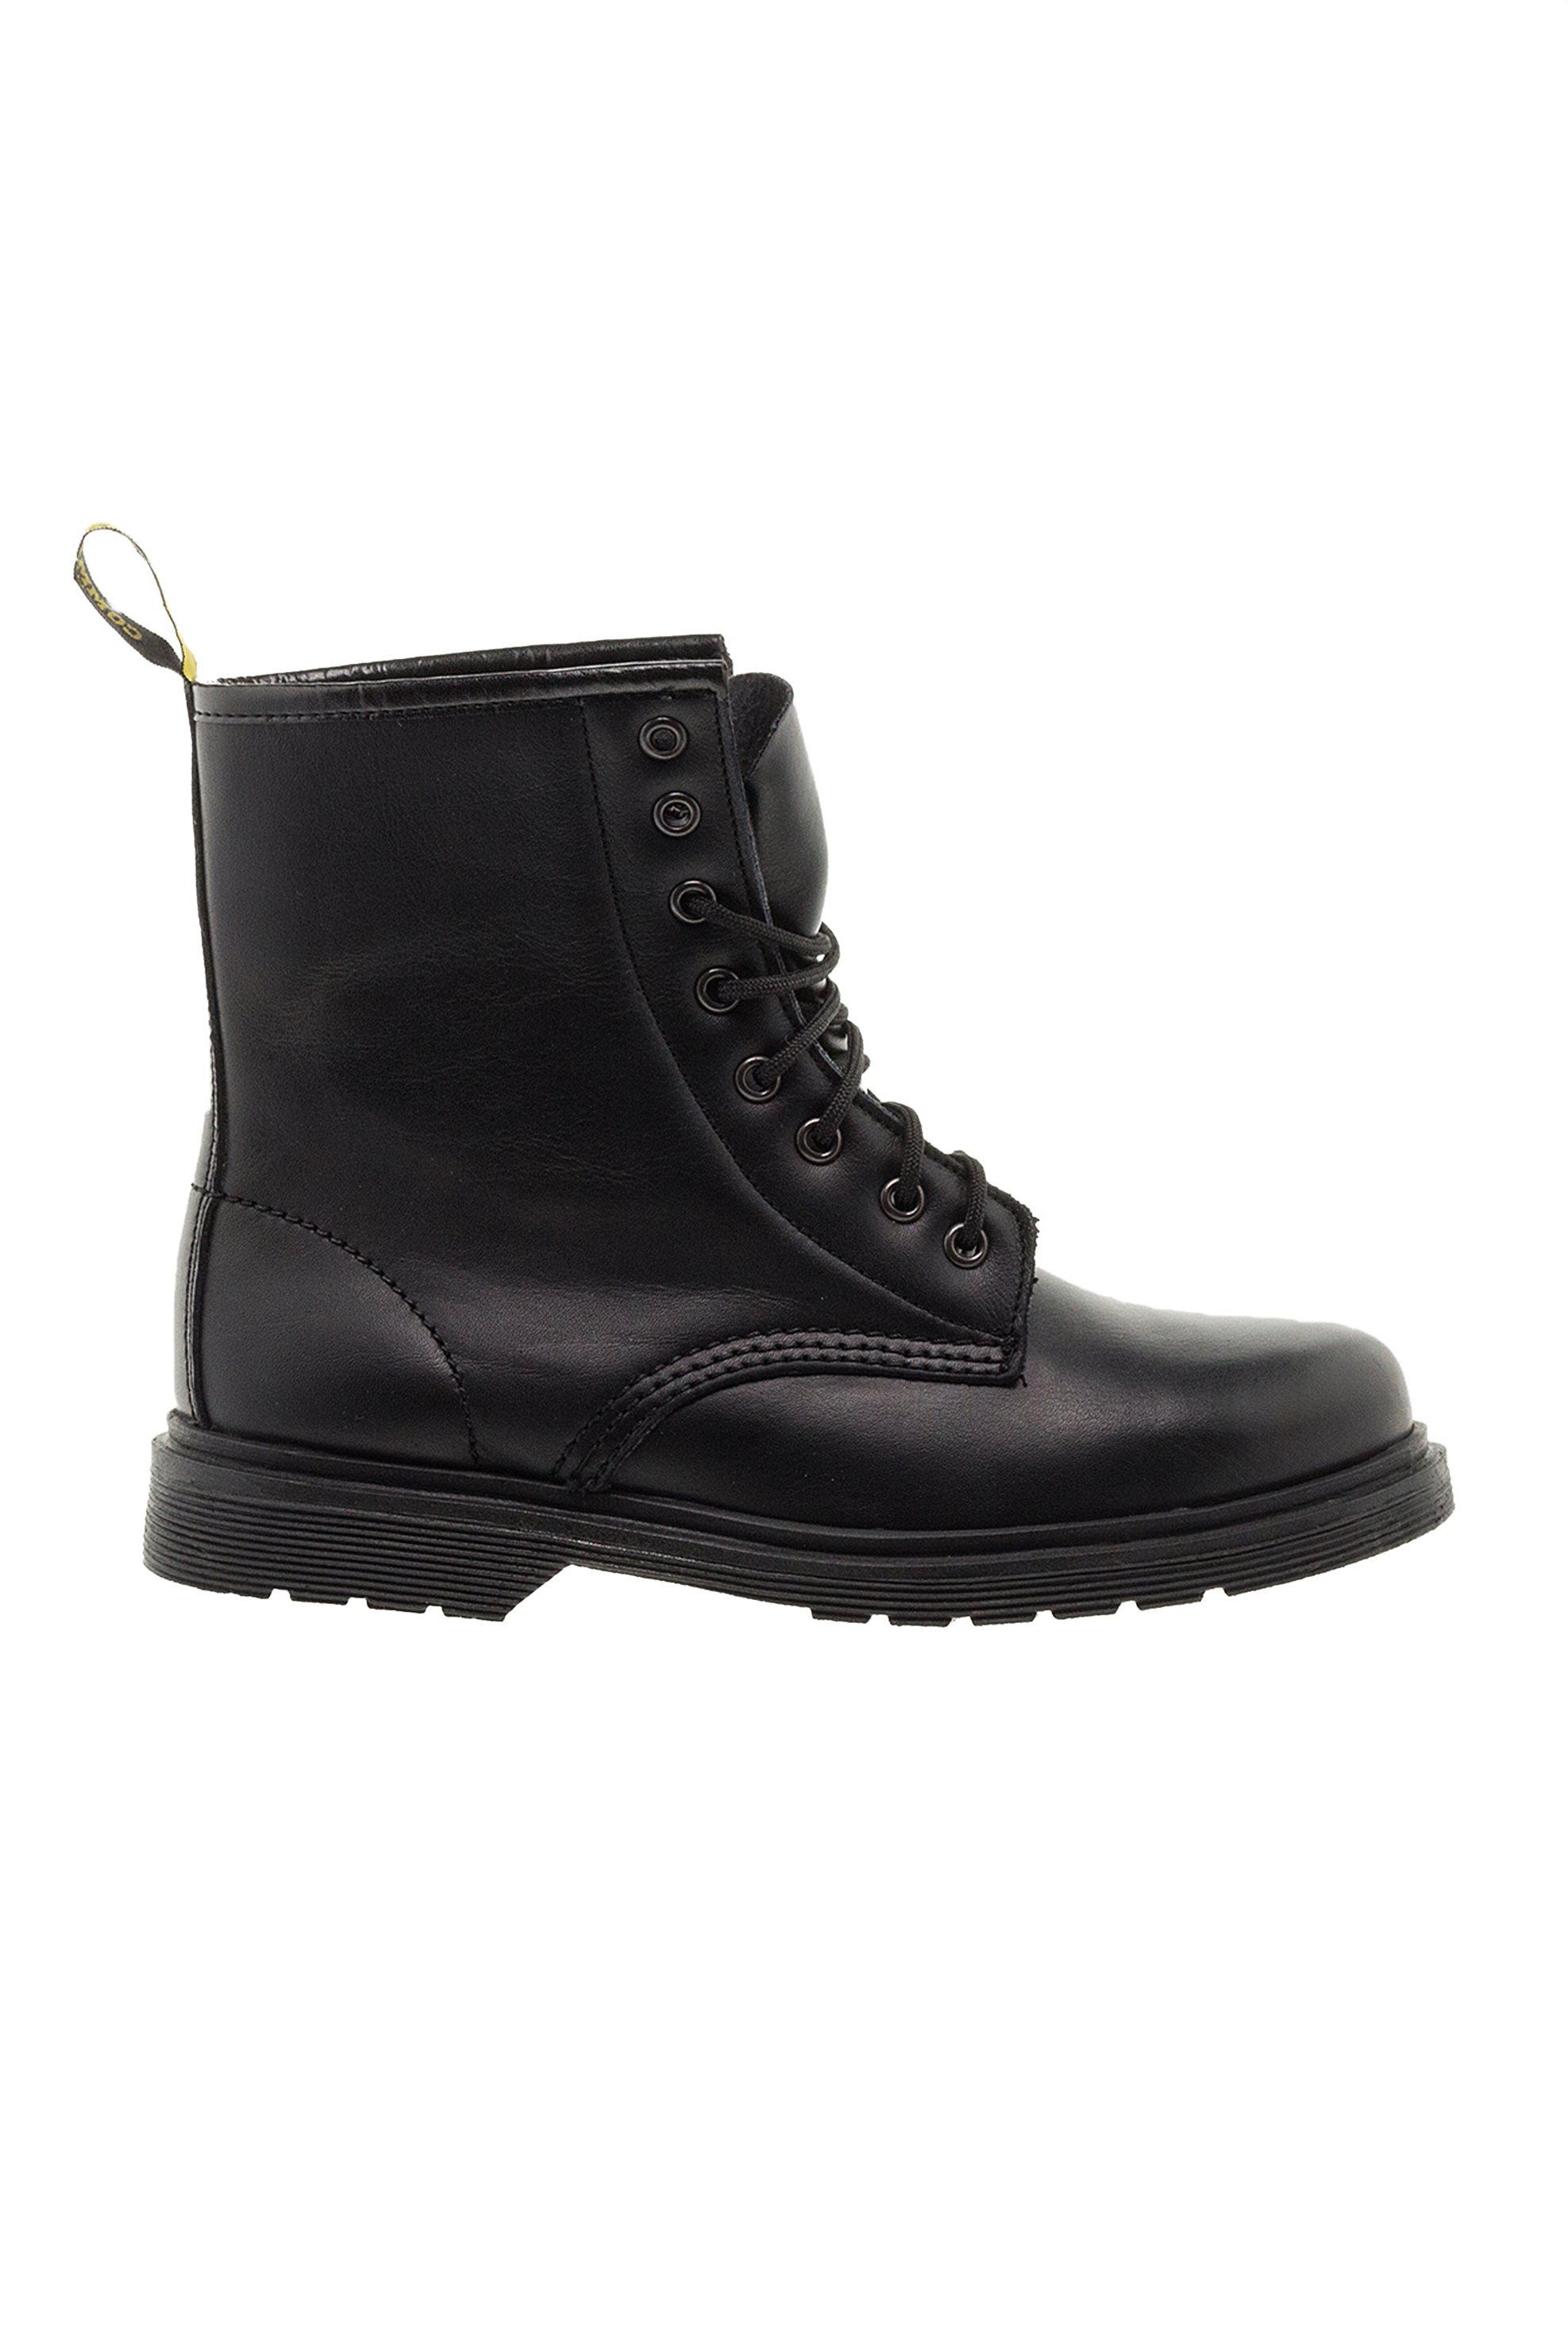 Commanchero γυναικεία δερμάτινα αρβυλάκια με κορδόνια - CΟΜ-5373 Χ18 - Μαύρο γυναικα   παπουτσια   μποτάκια